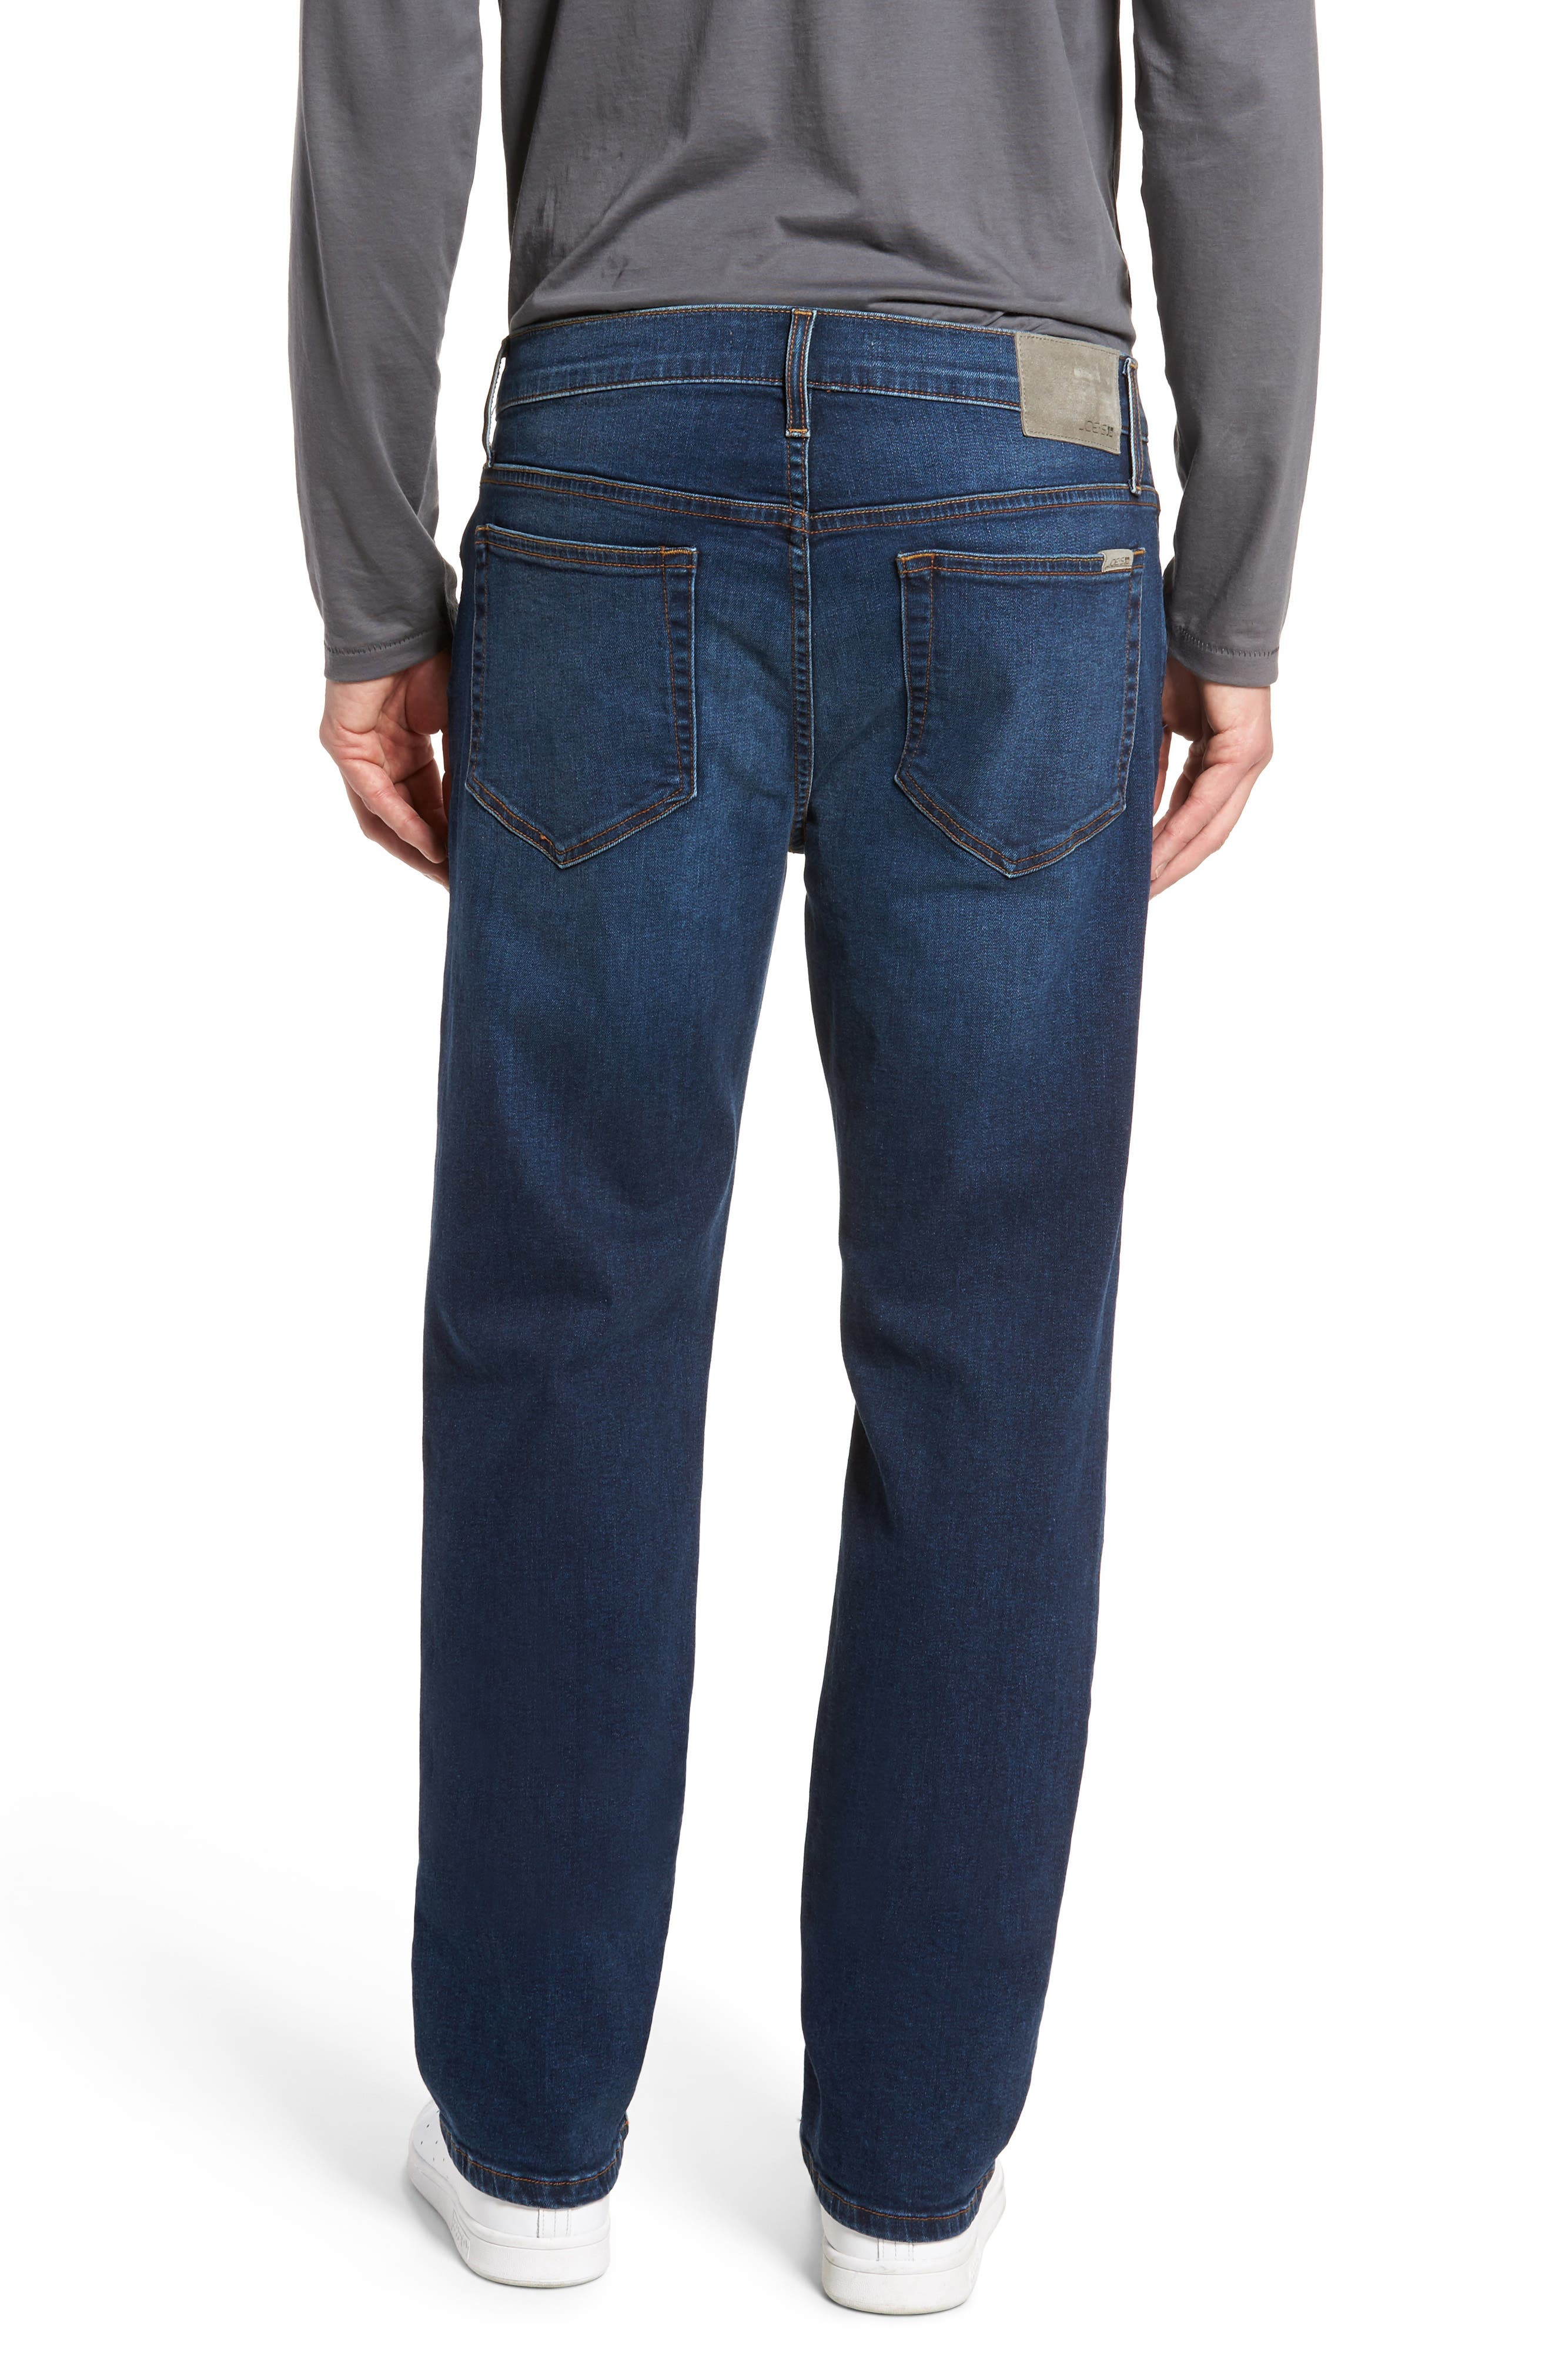 Brixton Slim Straight Leg Jeans,                             Alternate thumbnail 2, color,                             Line